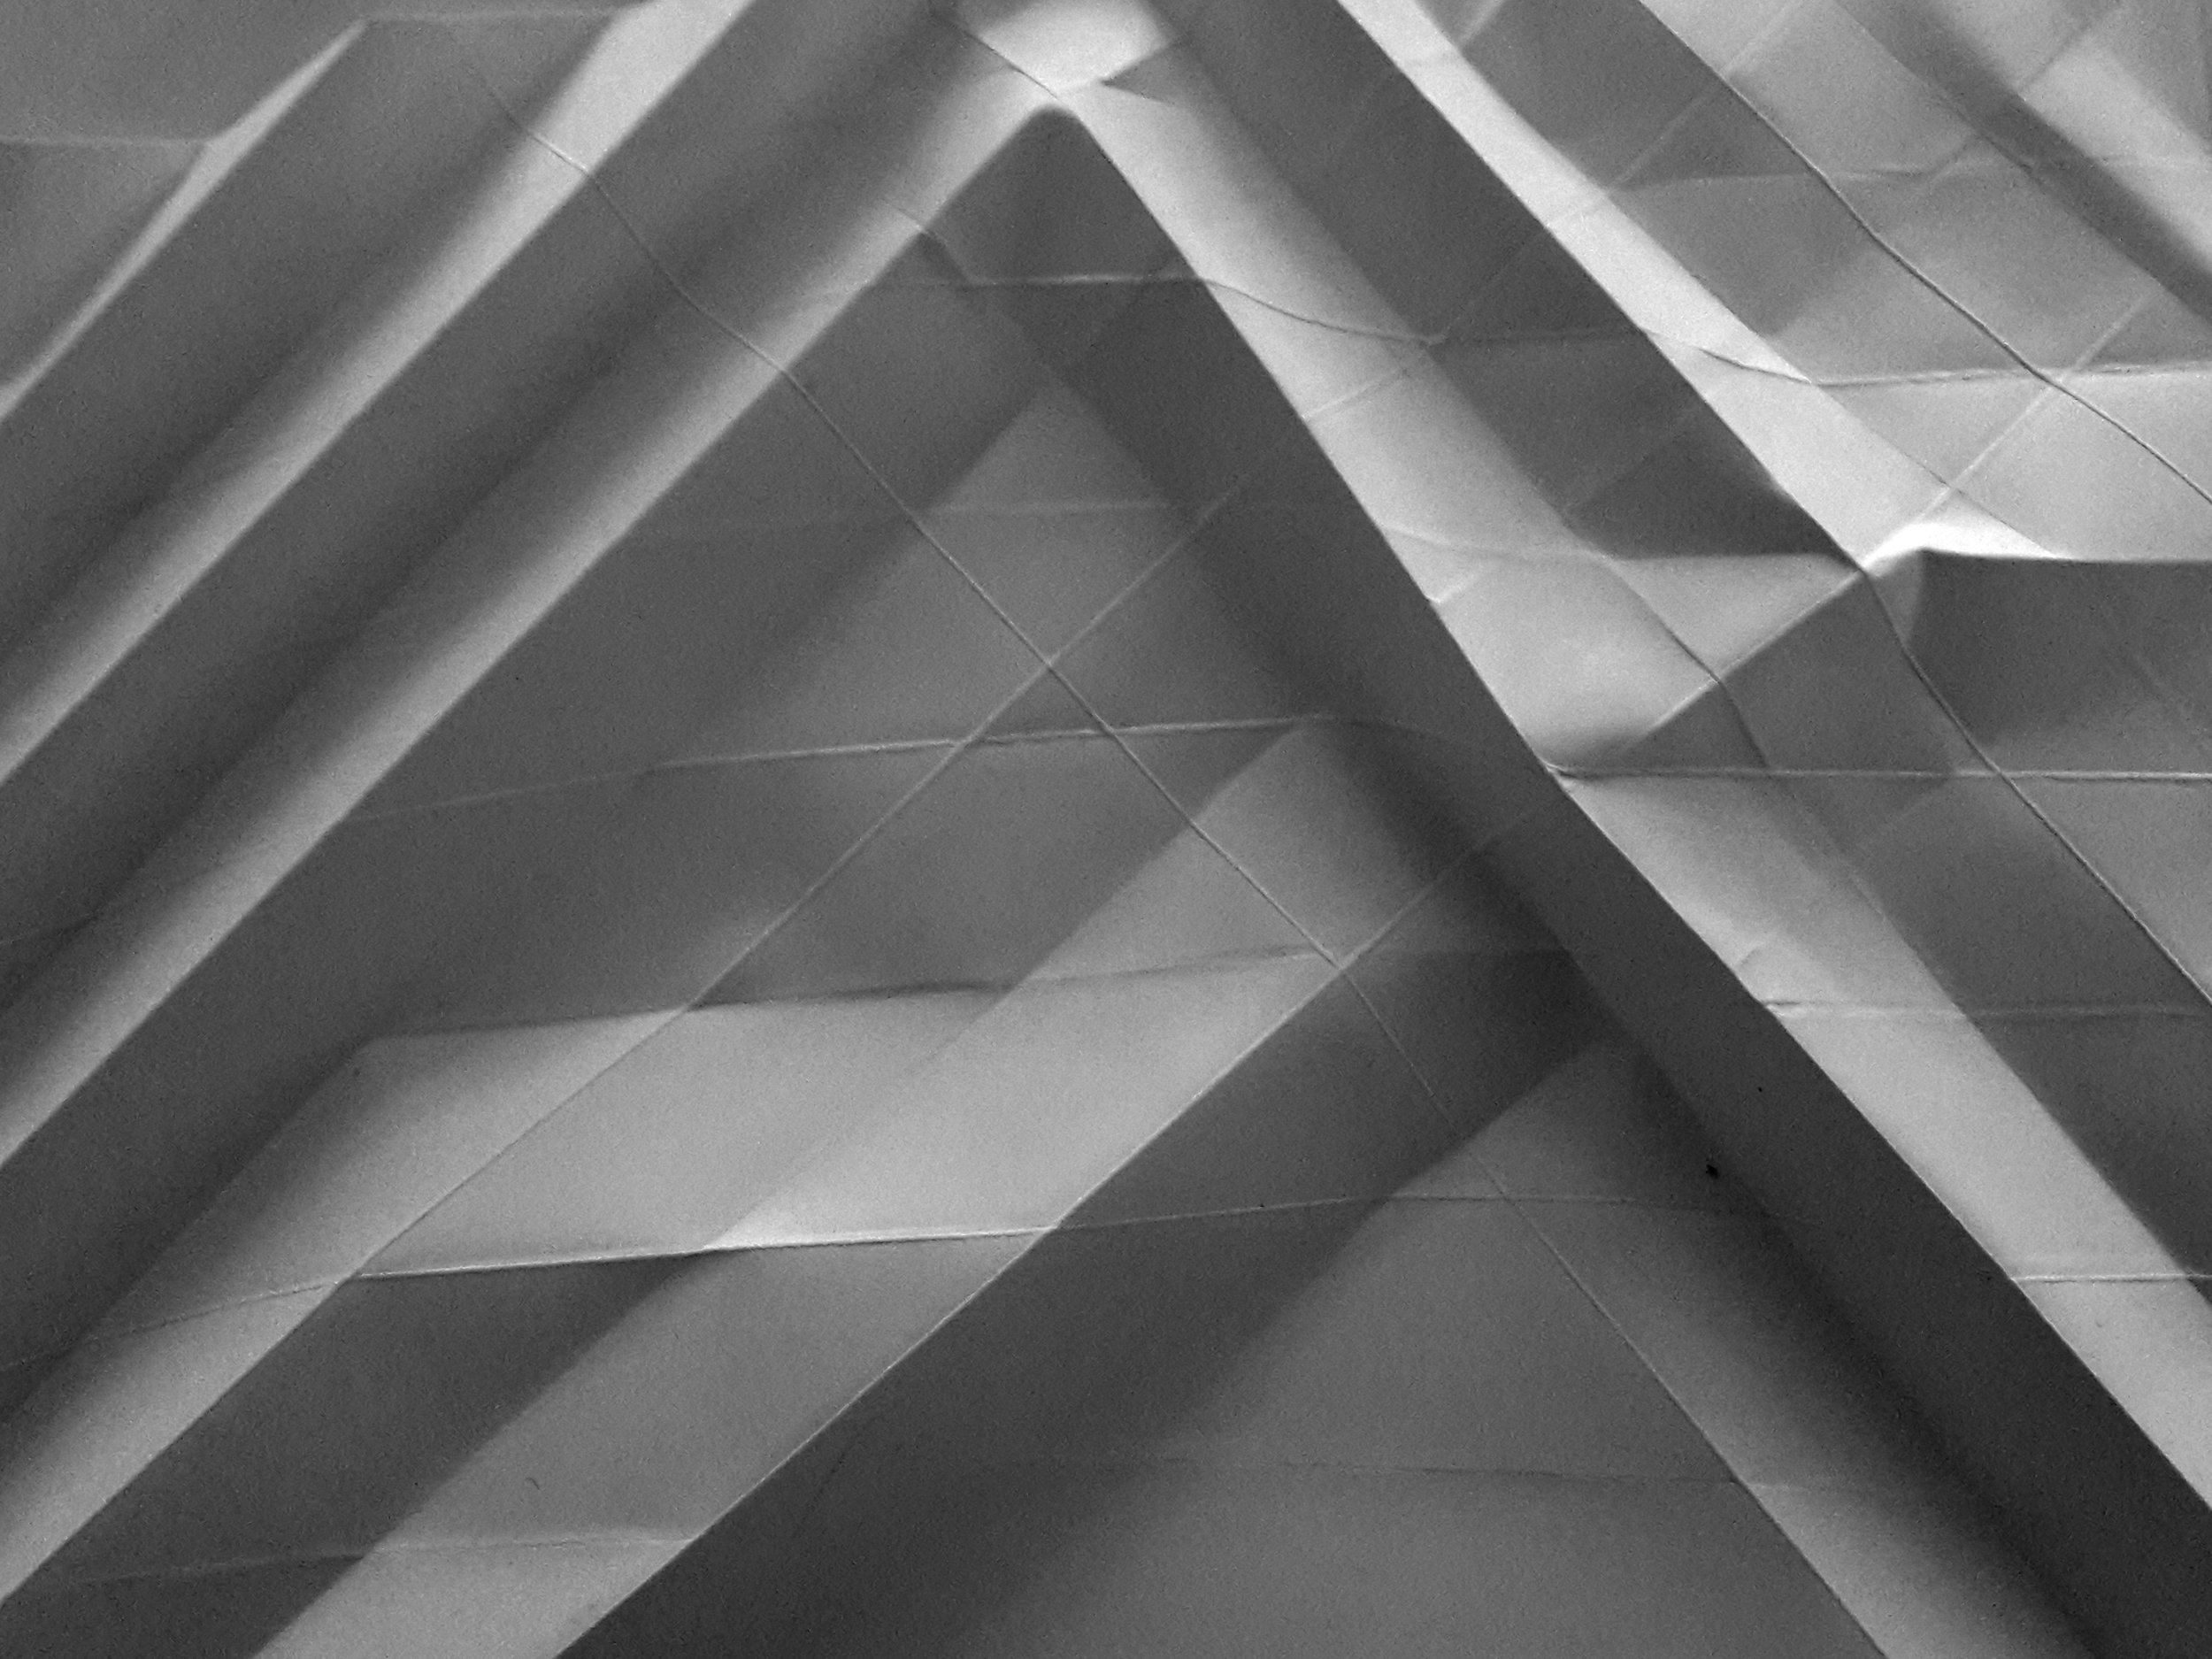 Origami_faltung_berg_tal.jpg